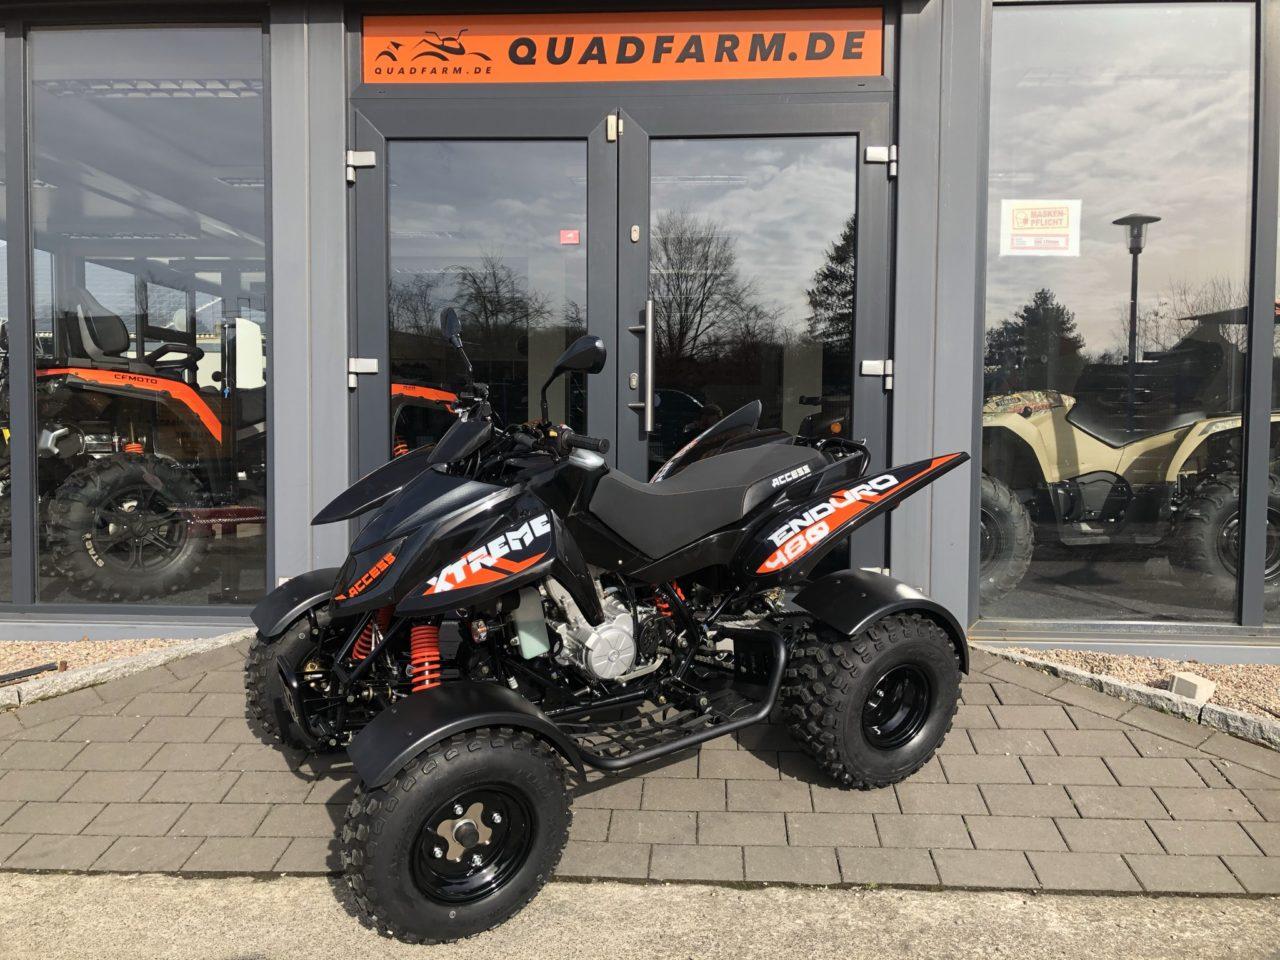 ATV / Quad Access Xtreme Enduro 480, 37 PS, 449 ccm, LOF